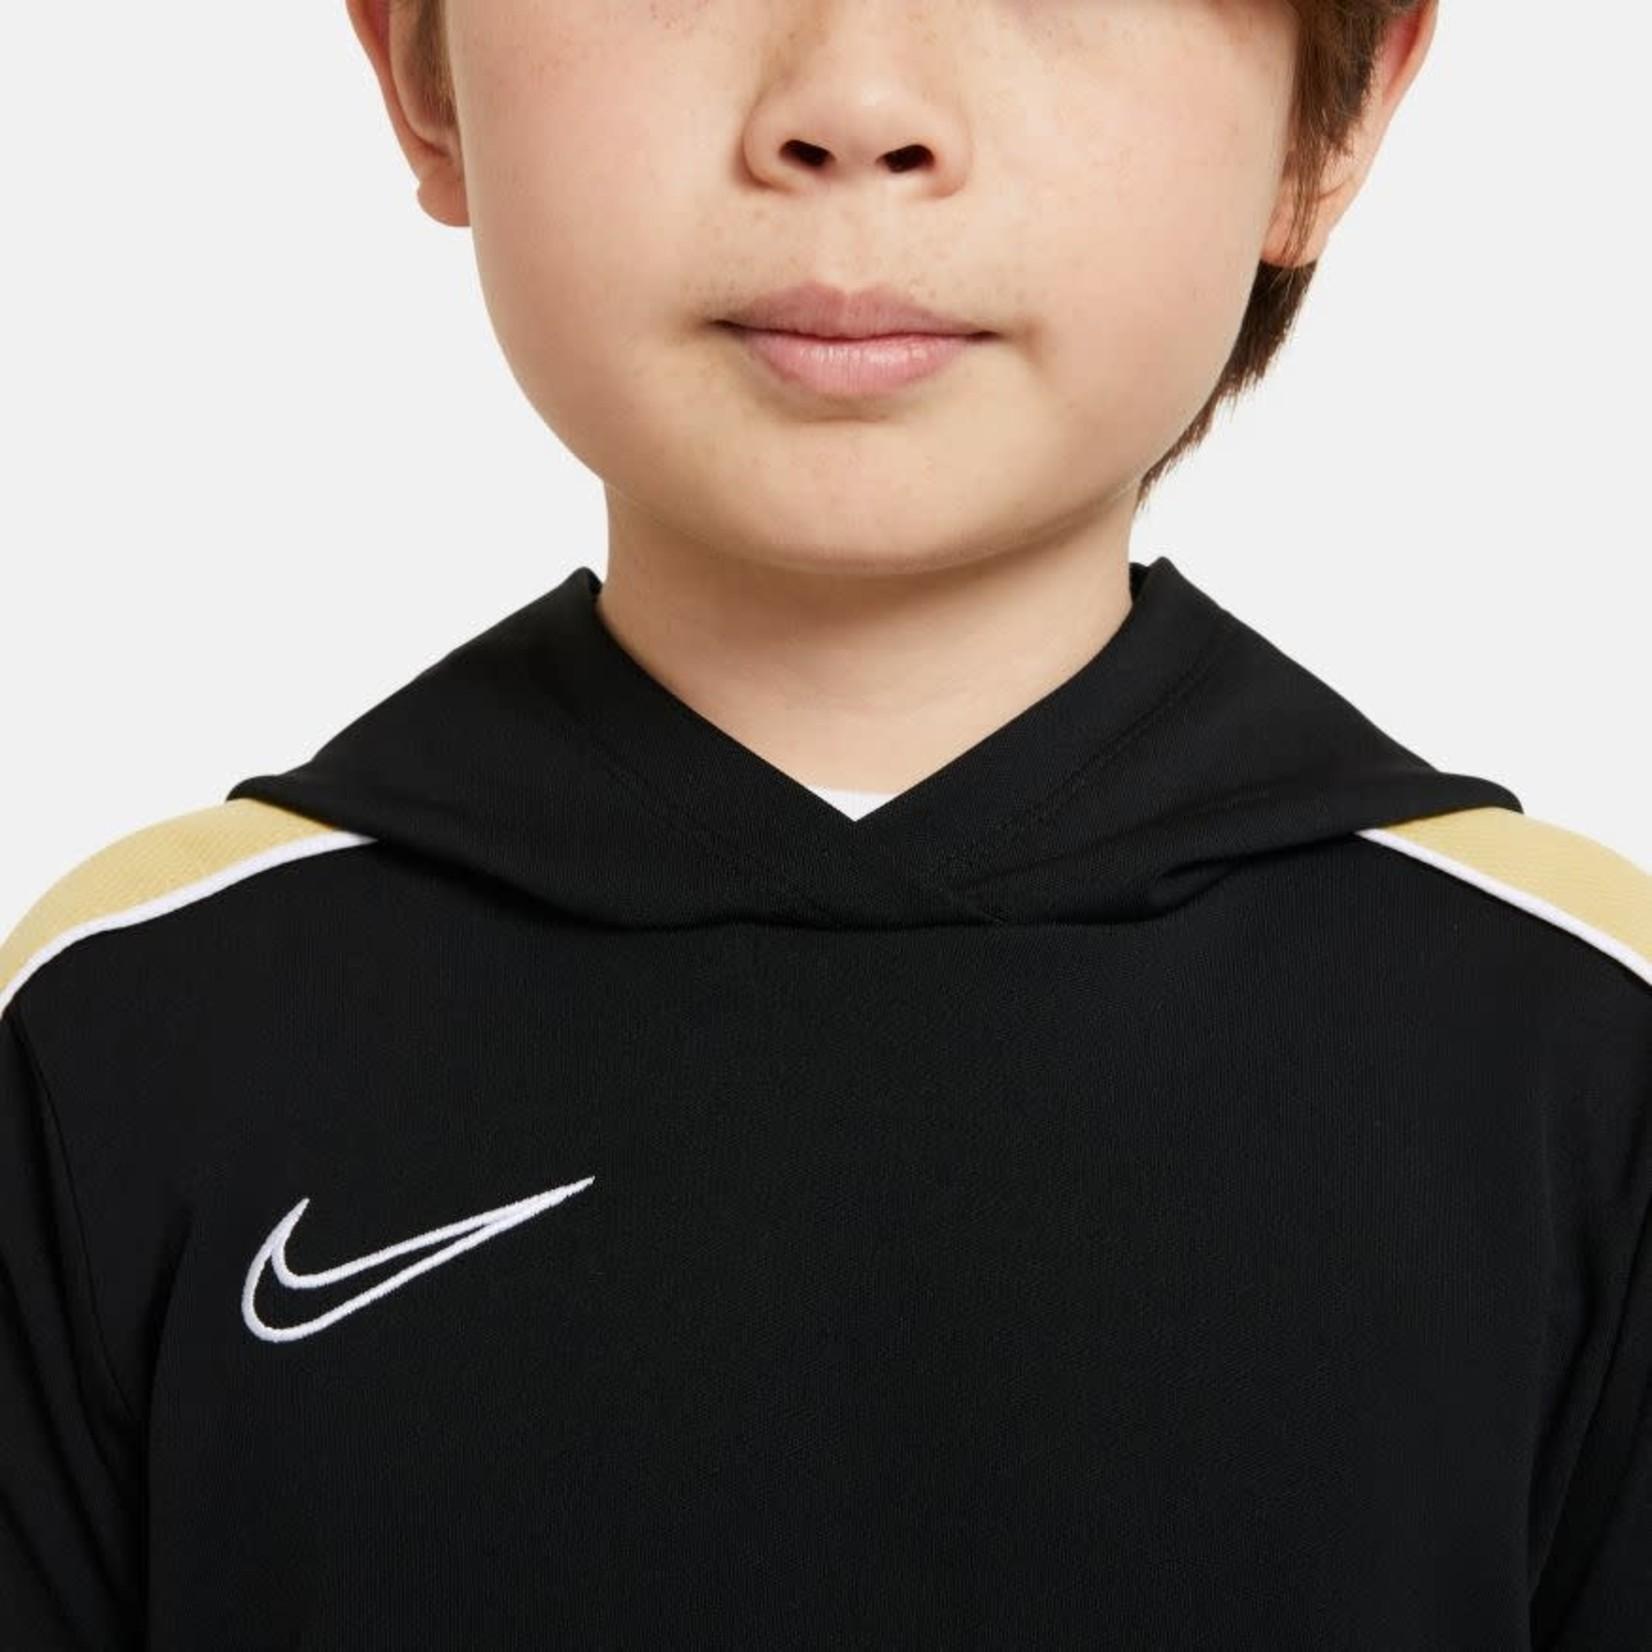 NIKE JOGA BONITO ACADEMY HOODIE YOUTH (BLACK/GOLD)